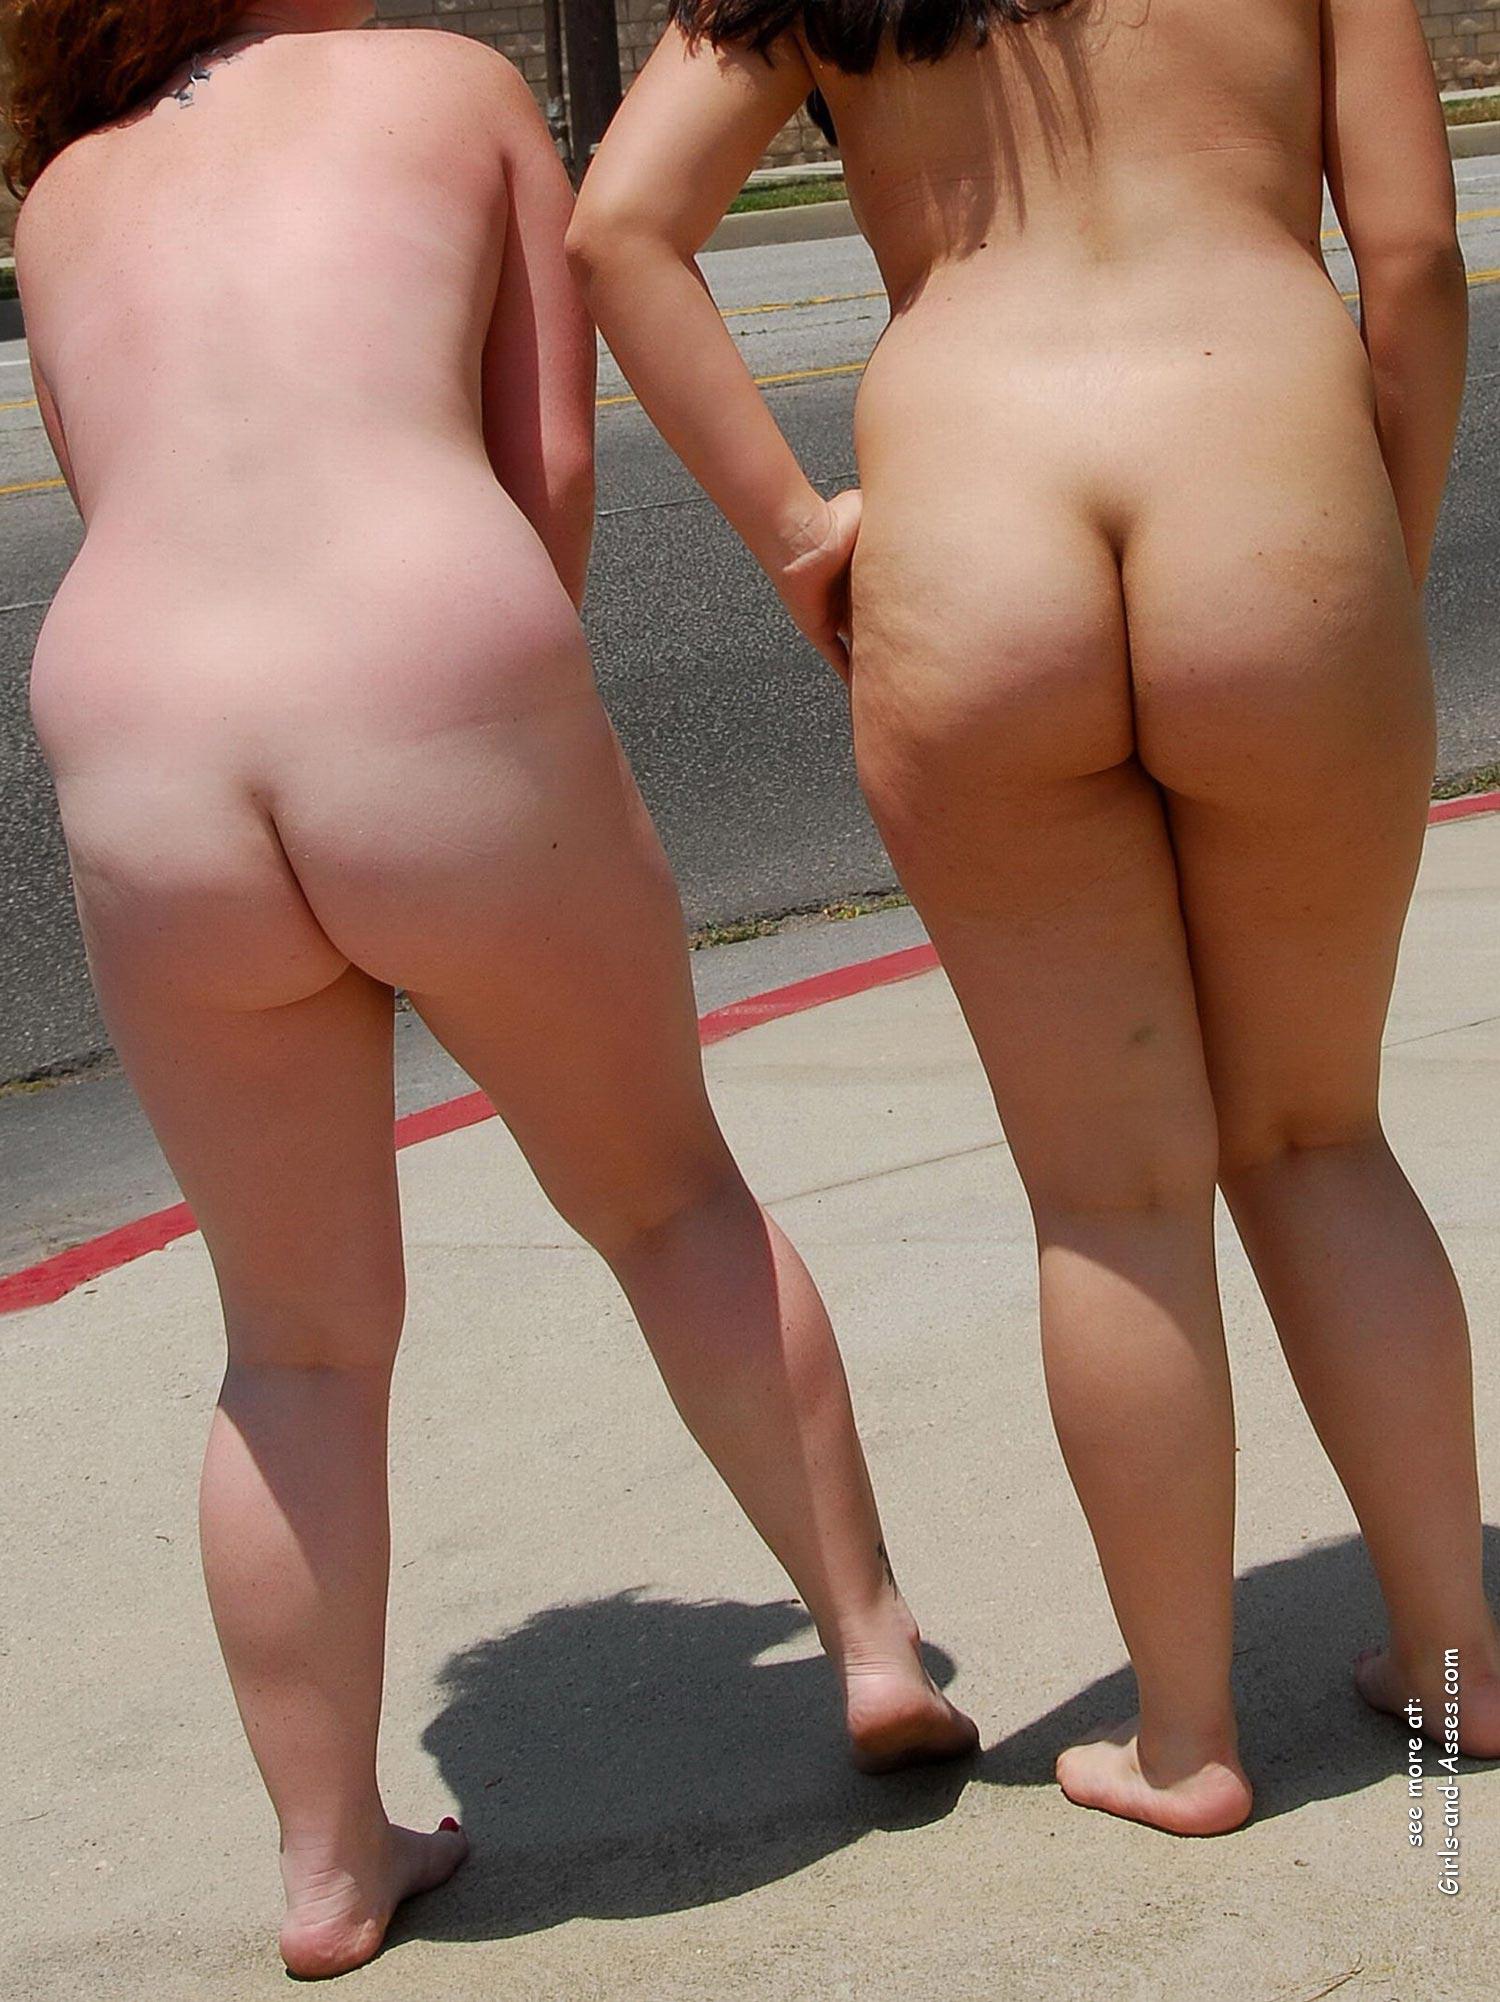 hot nude cheeks ass walking the street photo 01736